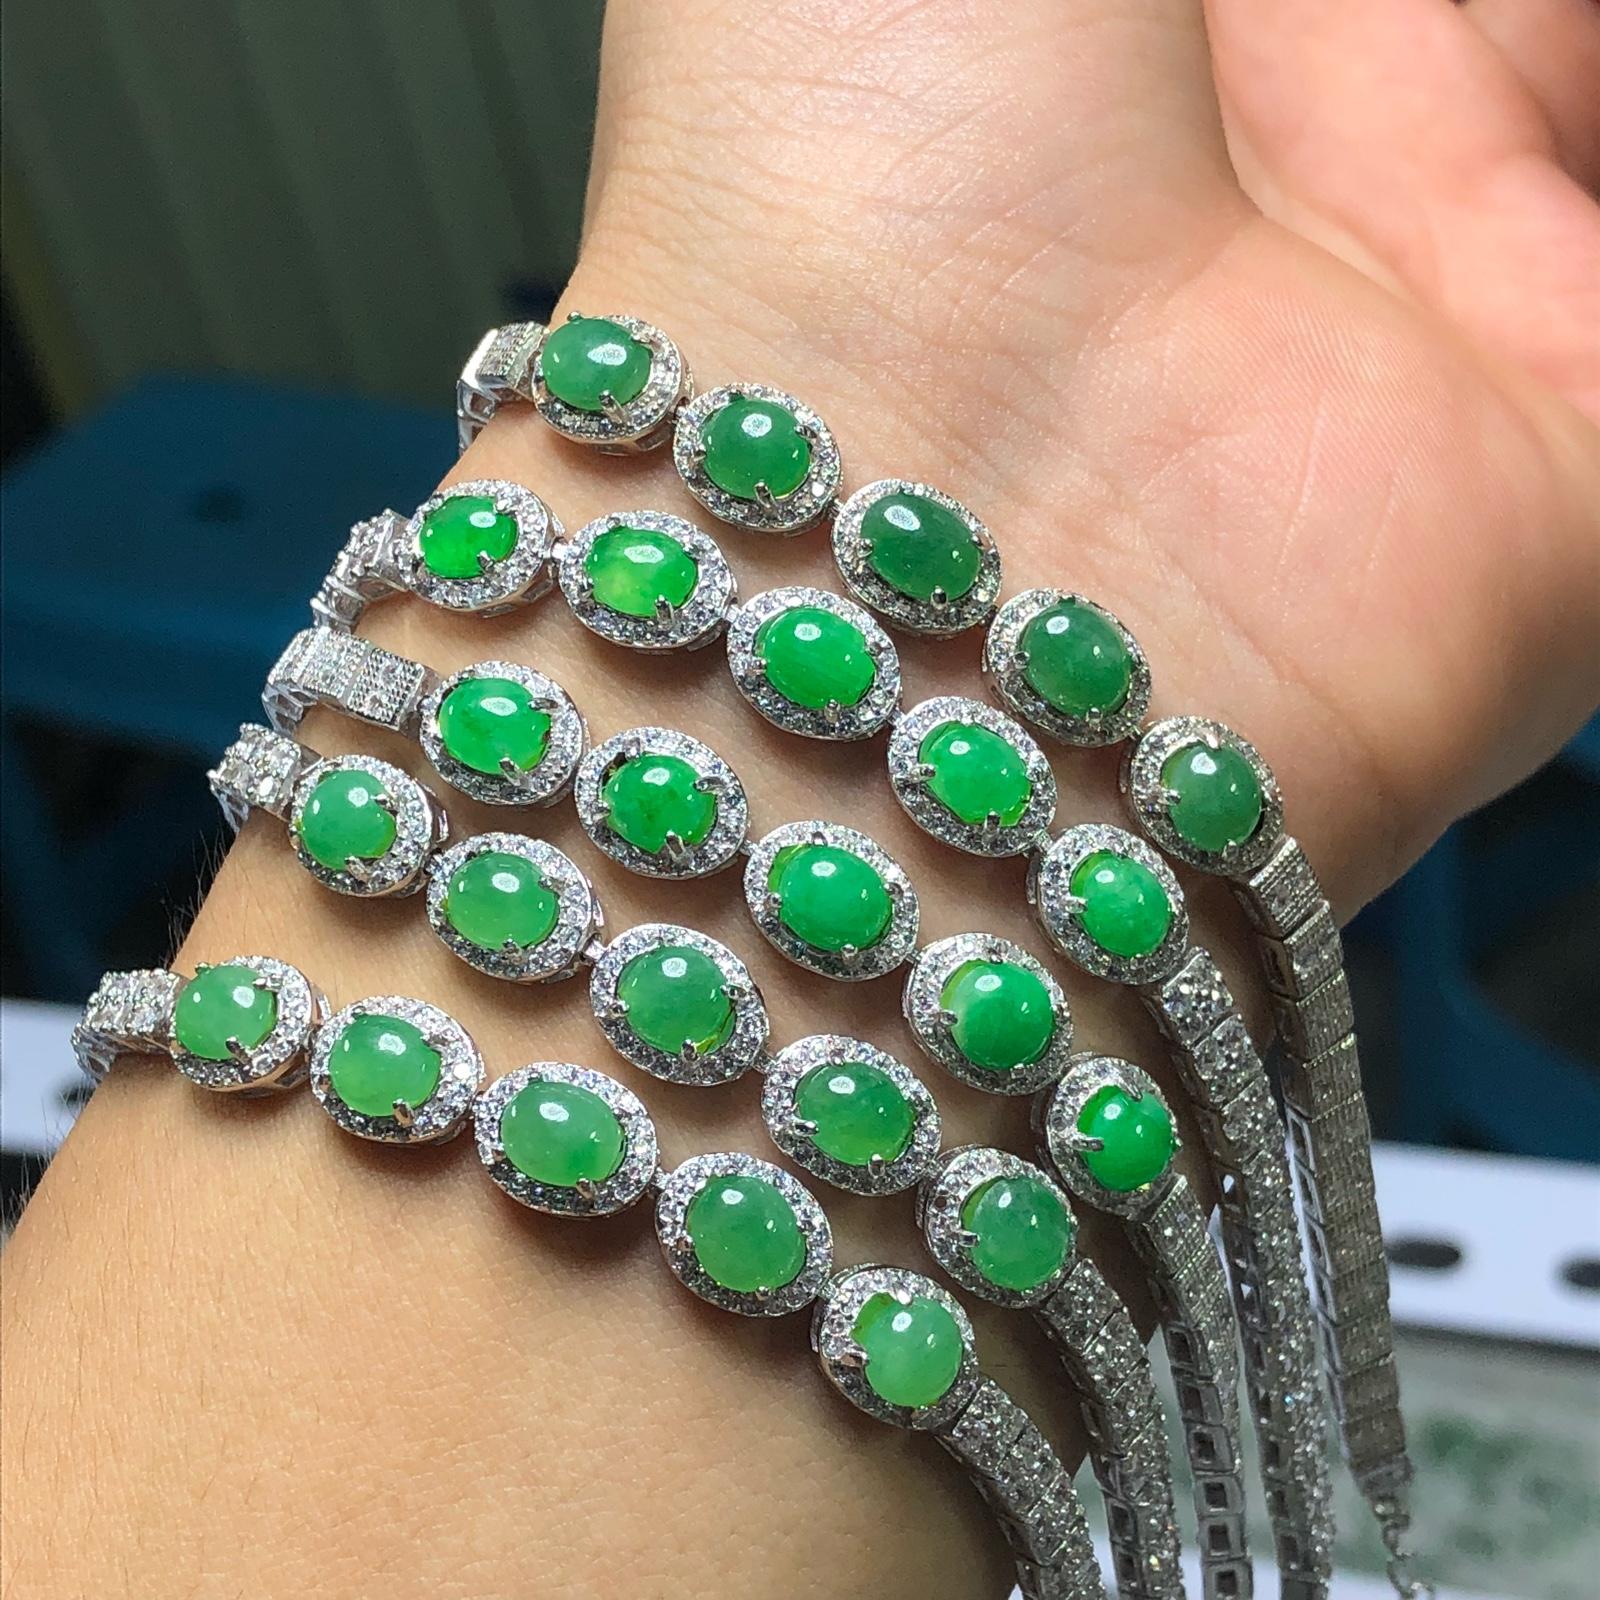 s925银镶嵌 缅甸翡翠a货天然 满绿豪华手链 玉石珠宝首饰